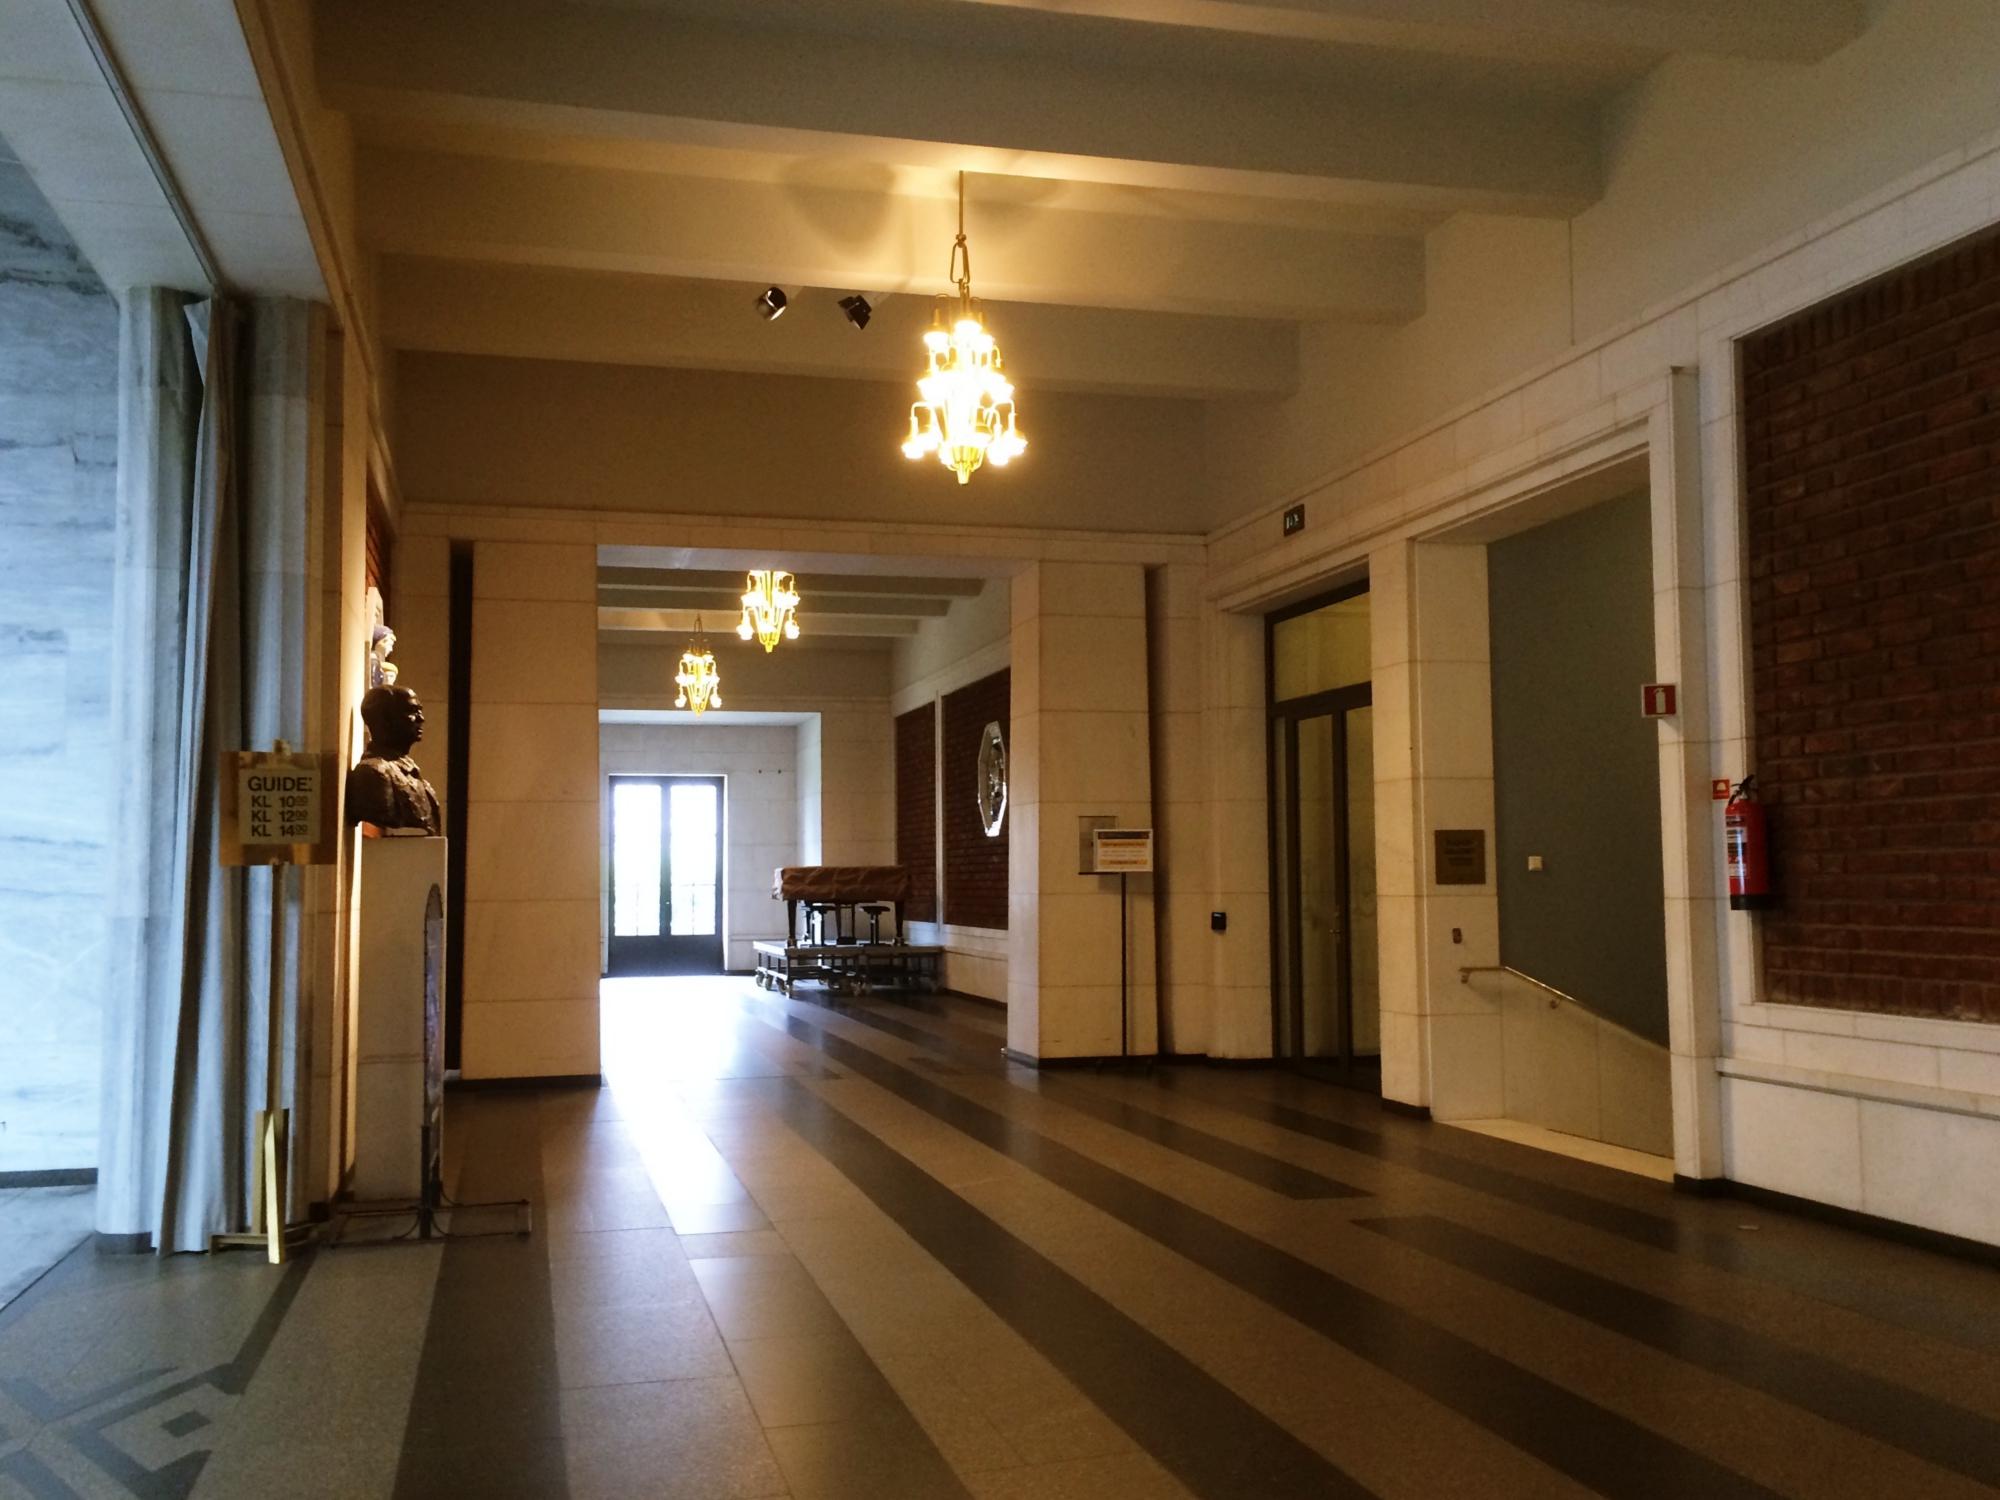 Oslo City Hall Entrance Lobby